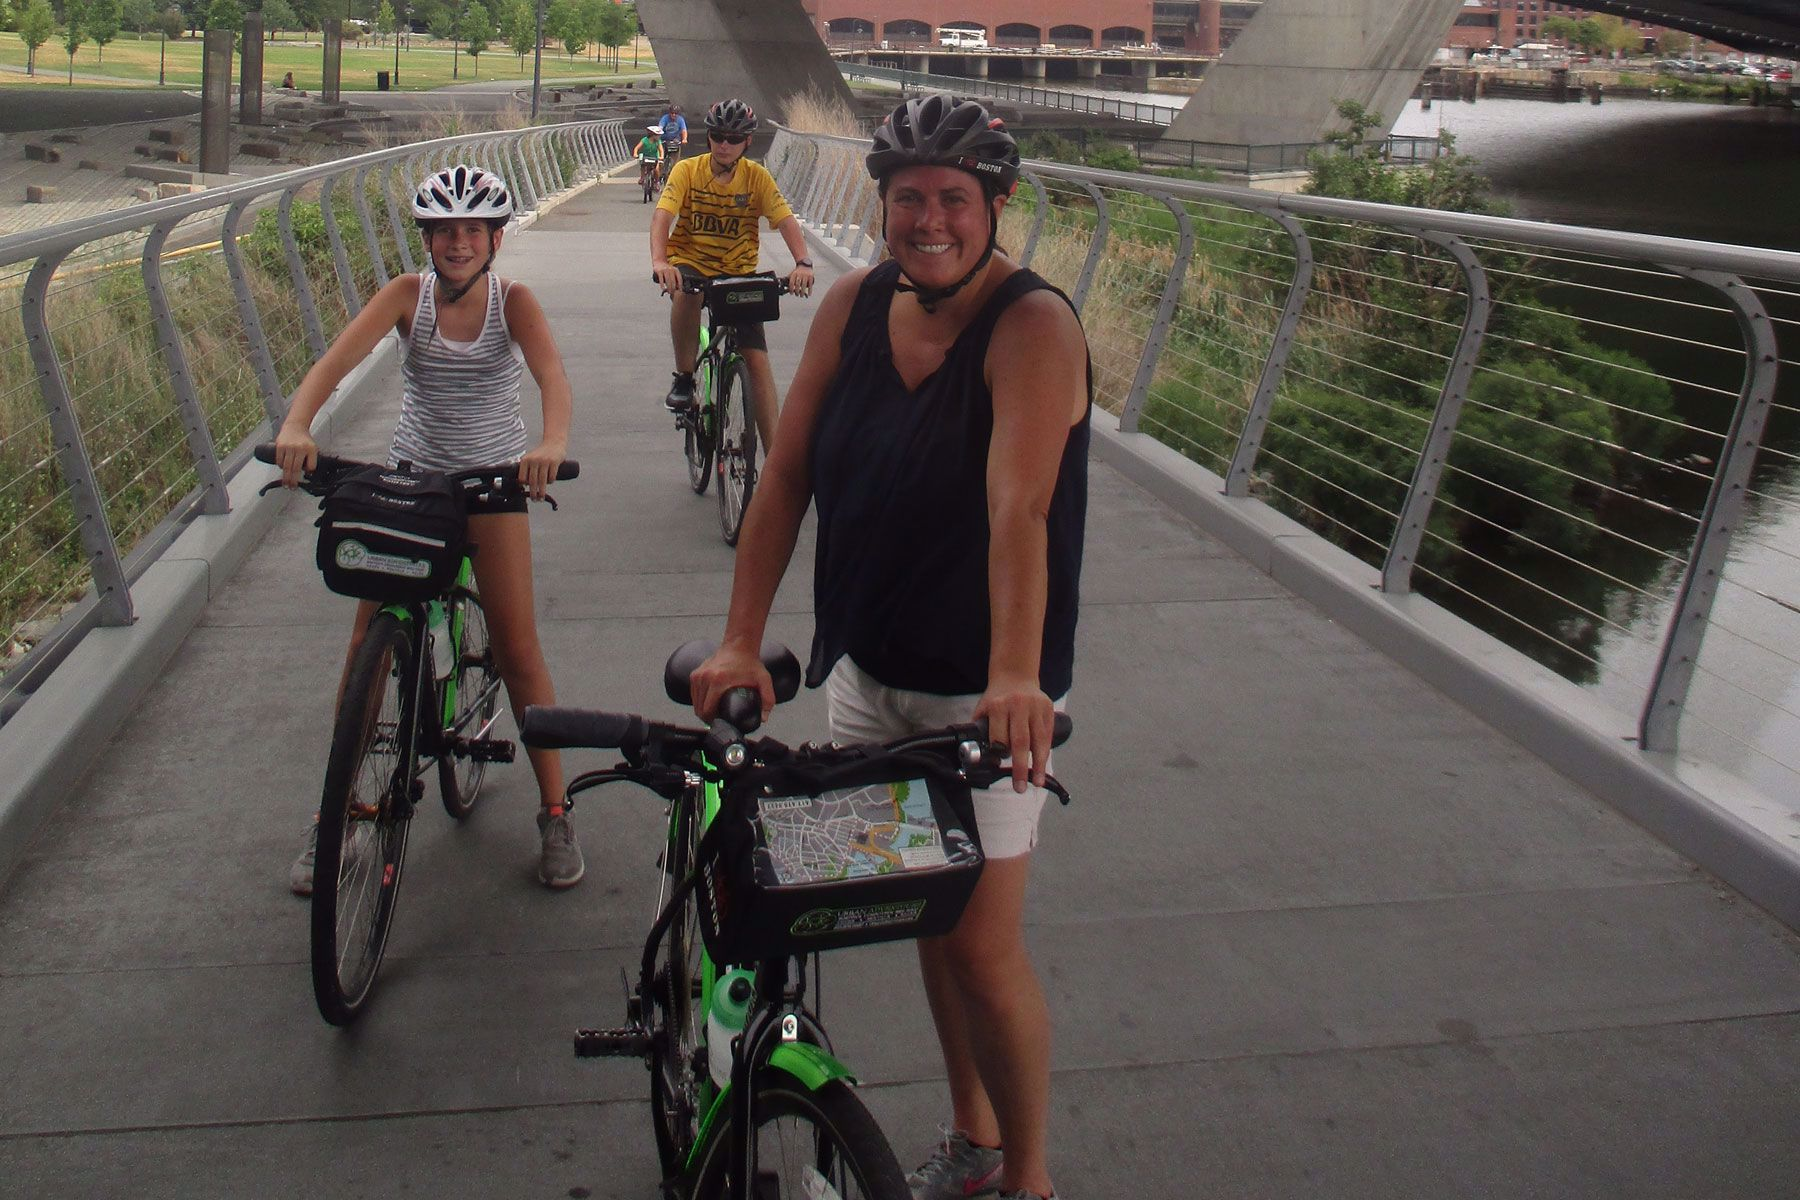 Family-friendly bike tour